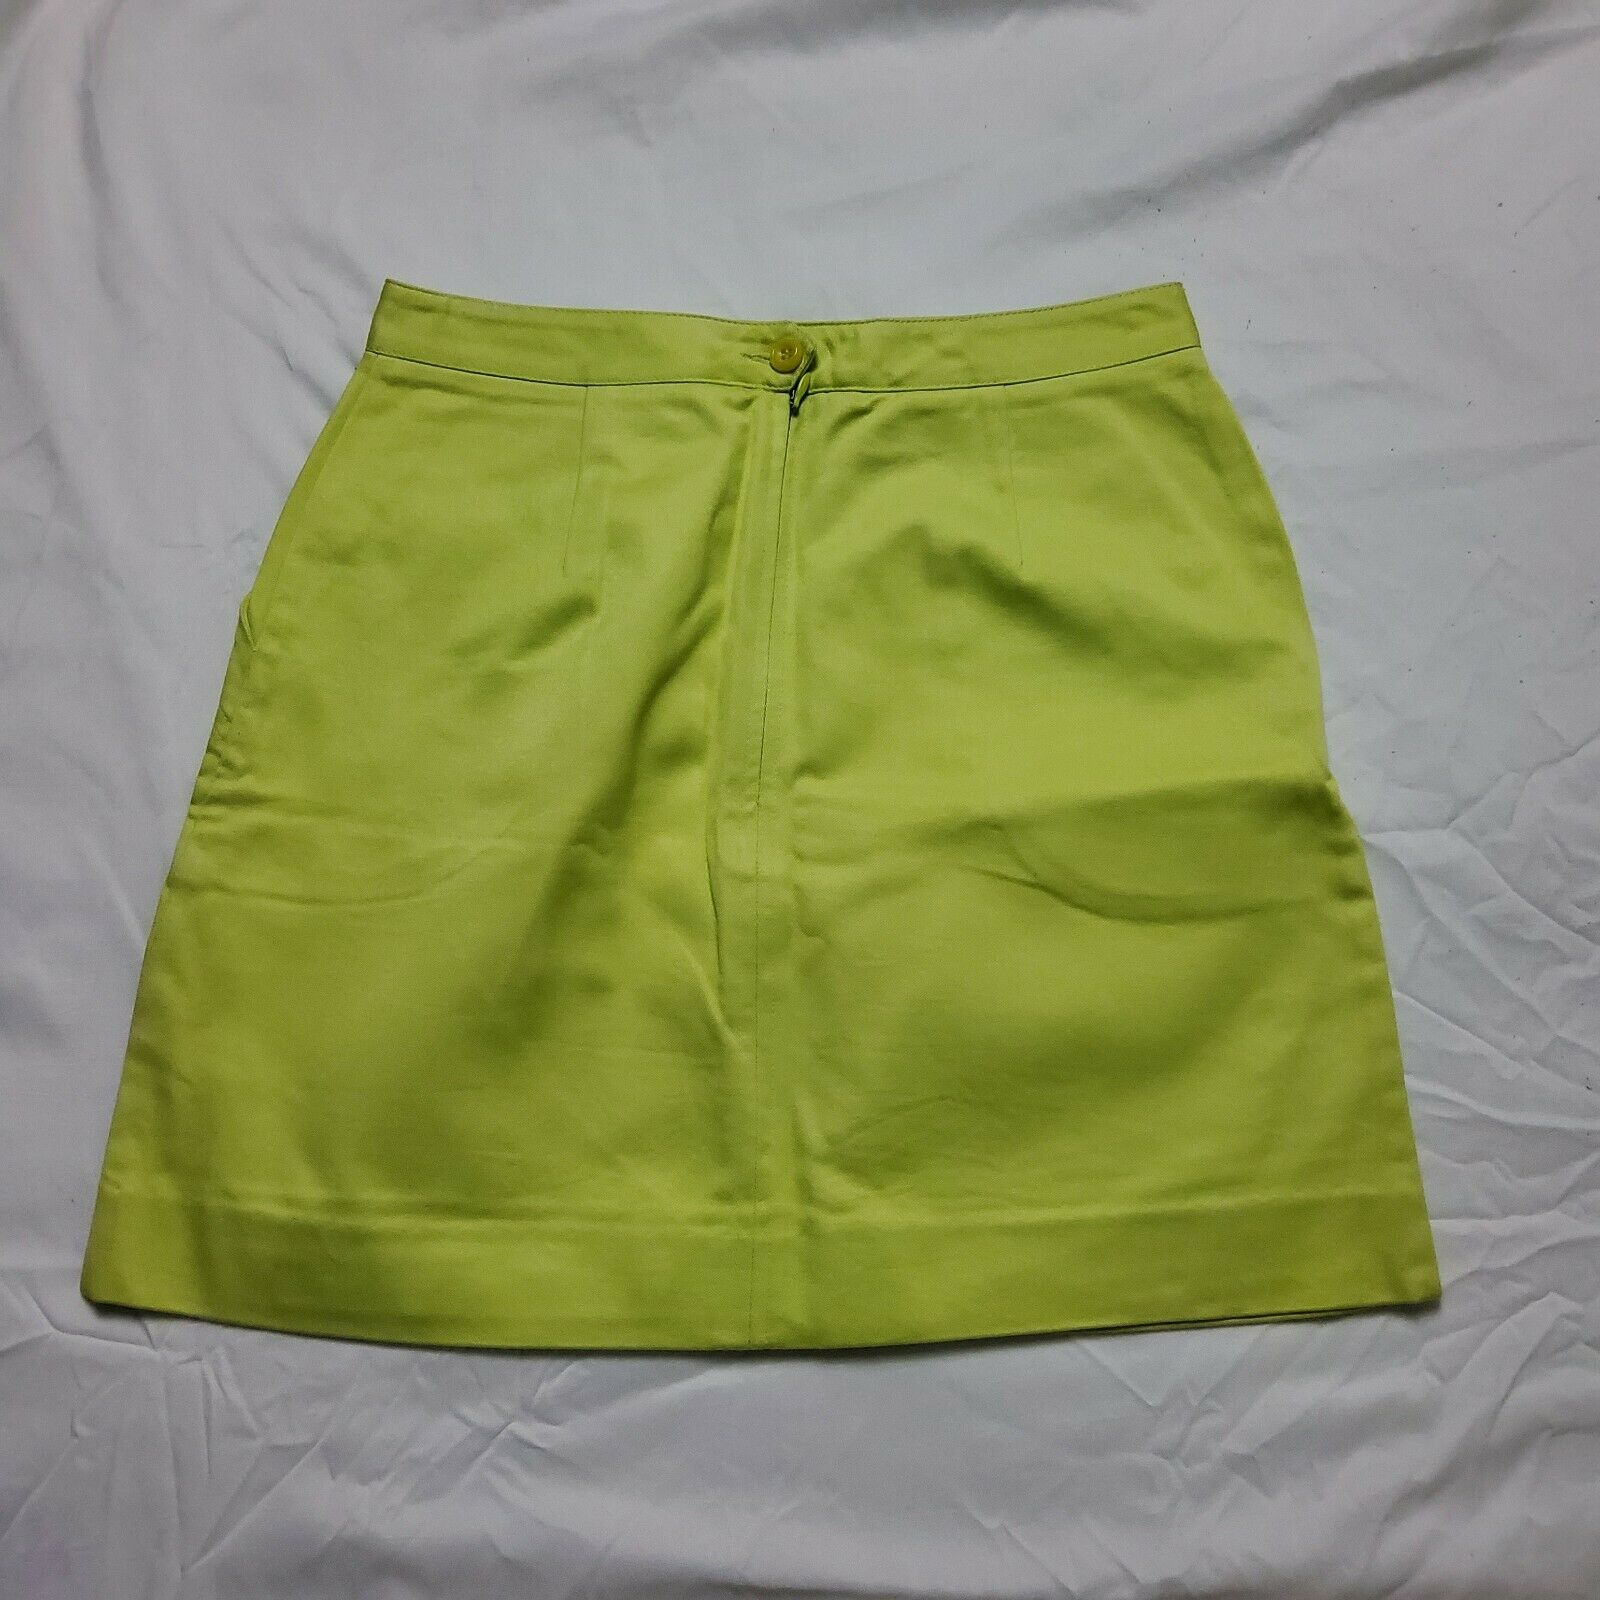 Esprit Neon Green Skirt - image 8